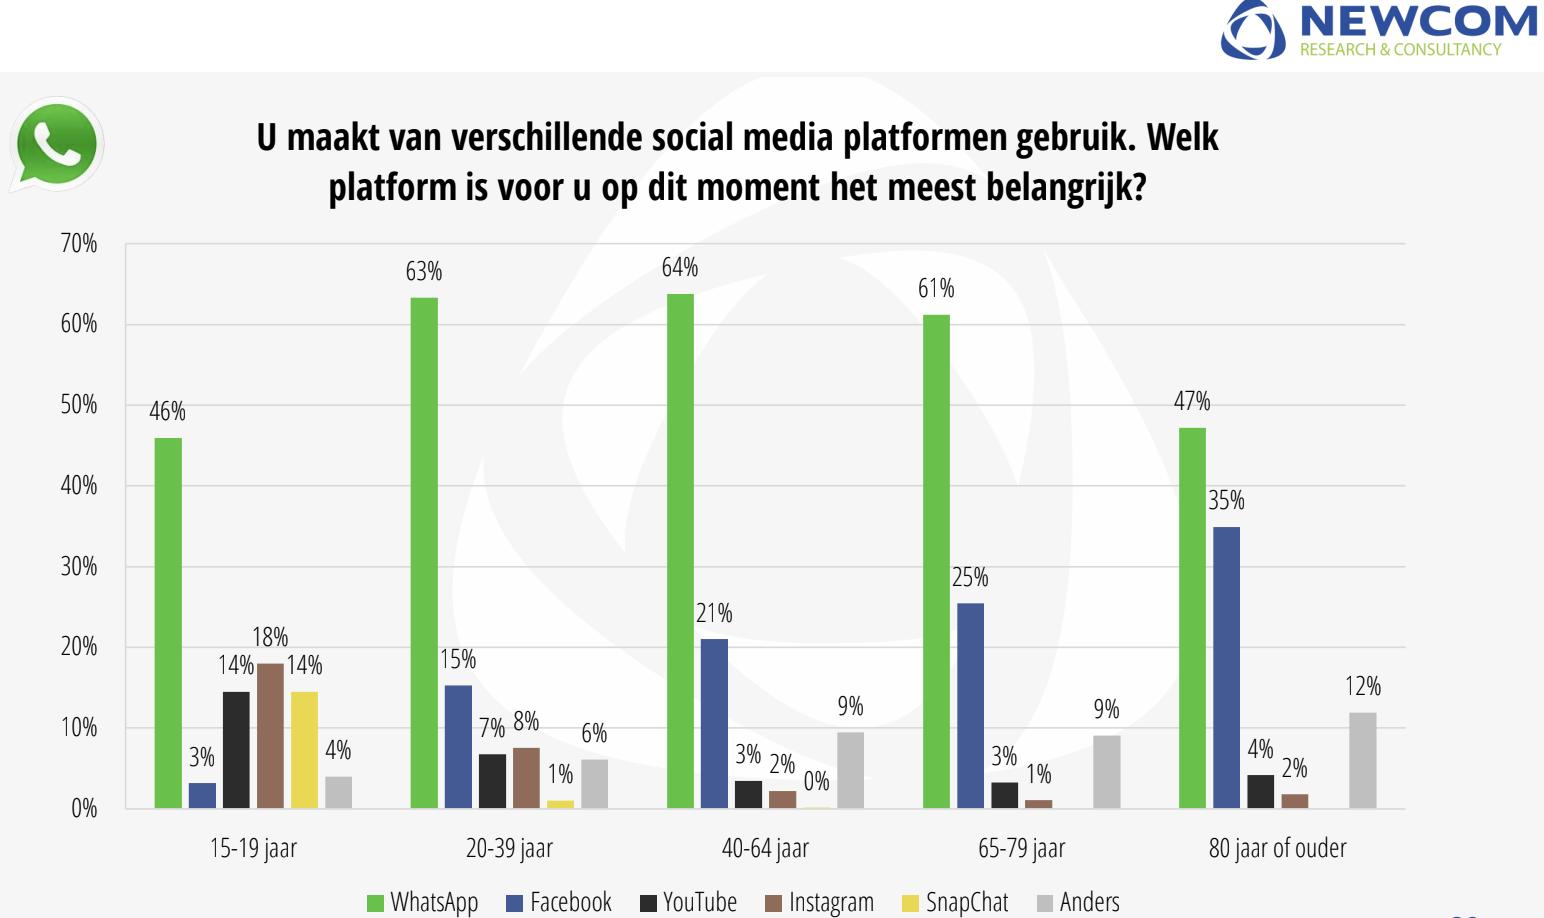 Newcom Social media statistieken OBI4wan